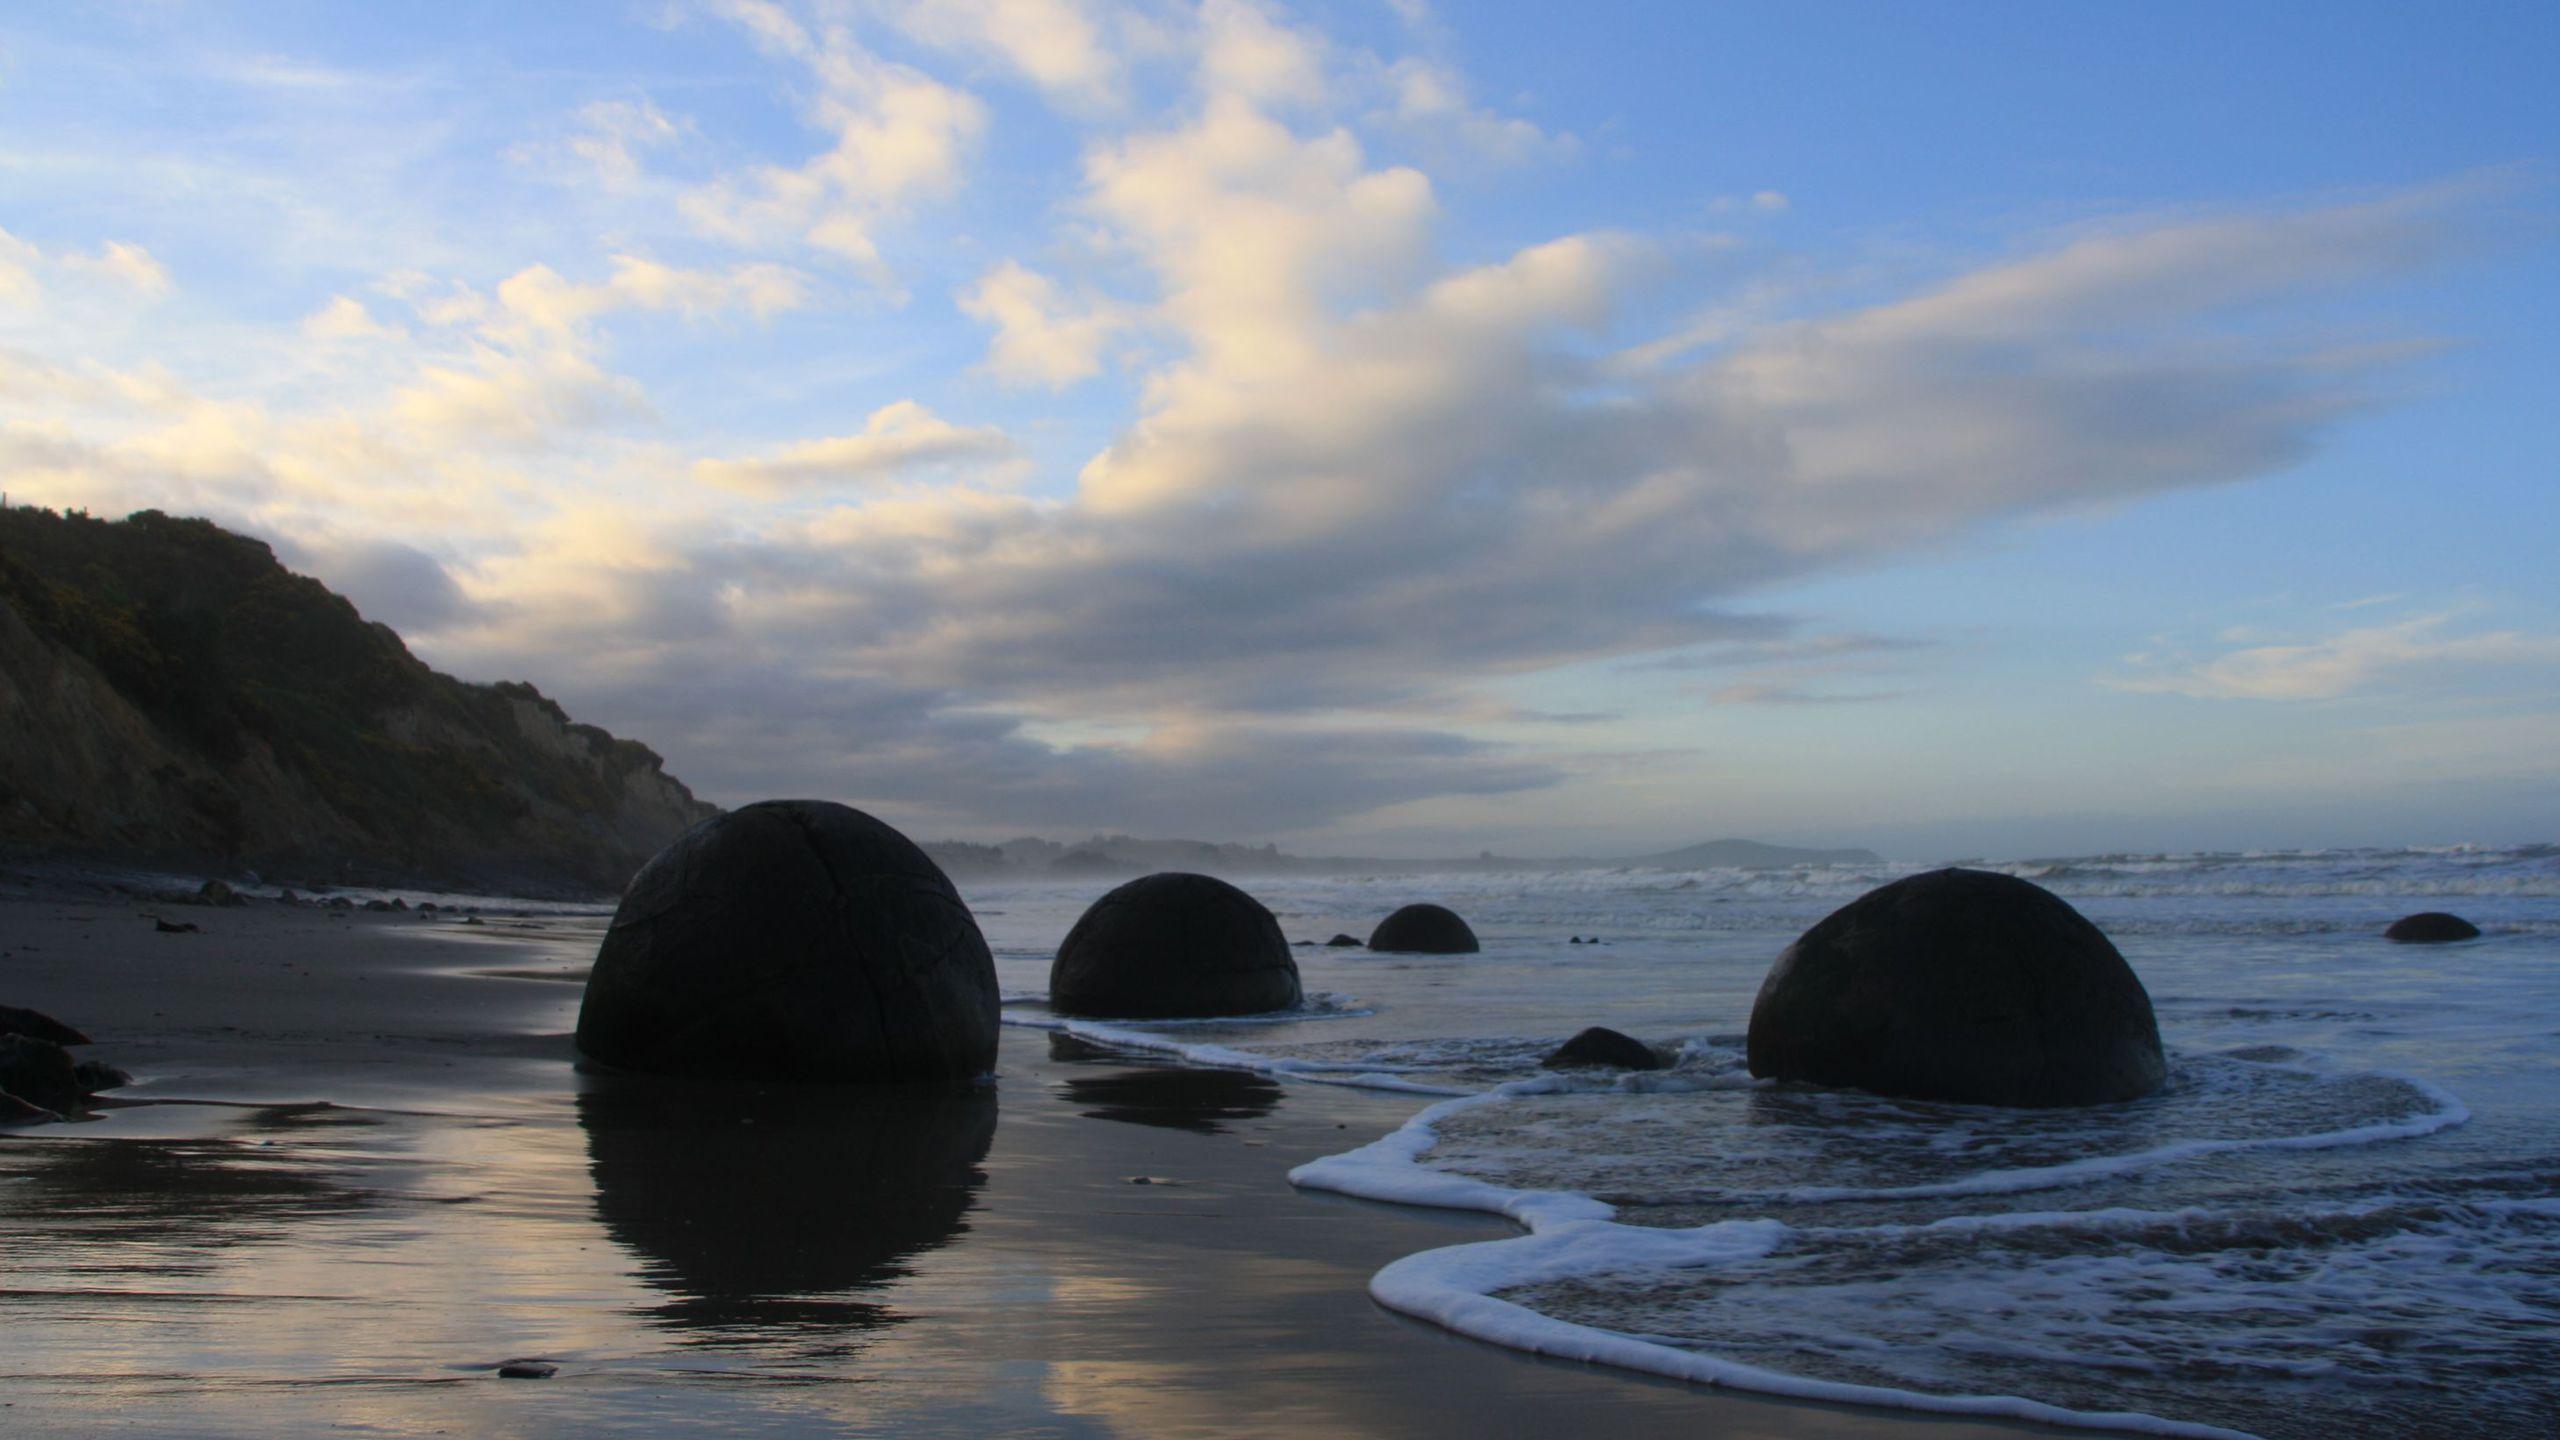 BOTPOST [BOTPOST] Balls Moeraki Boulders New Zealand iimgurcom 2560x1440